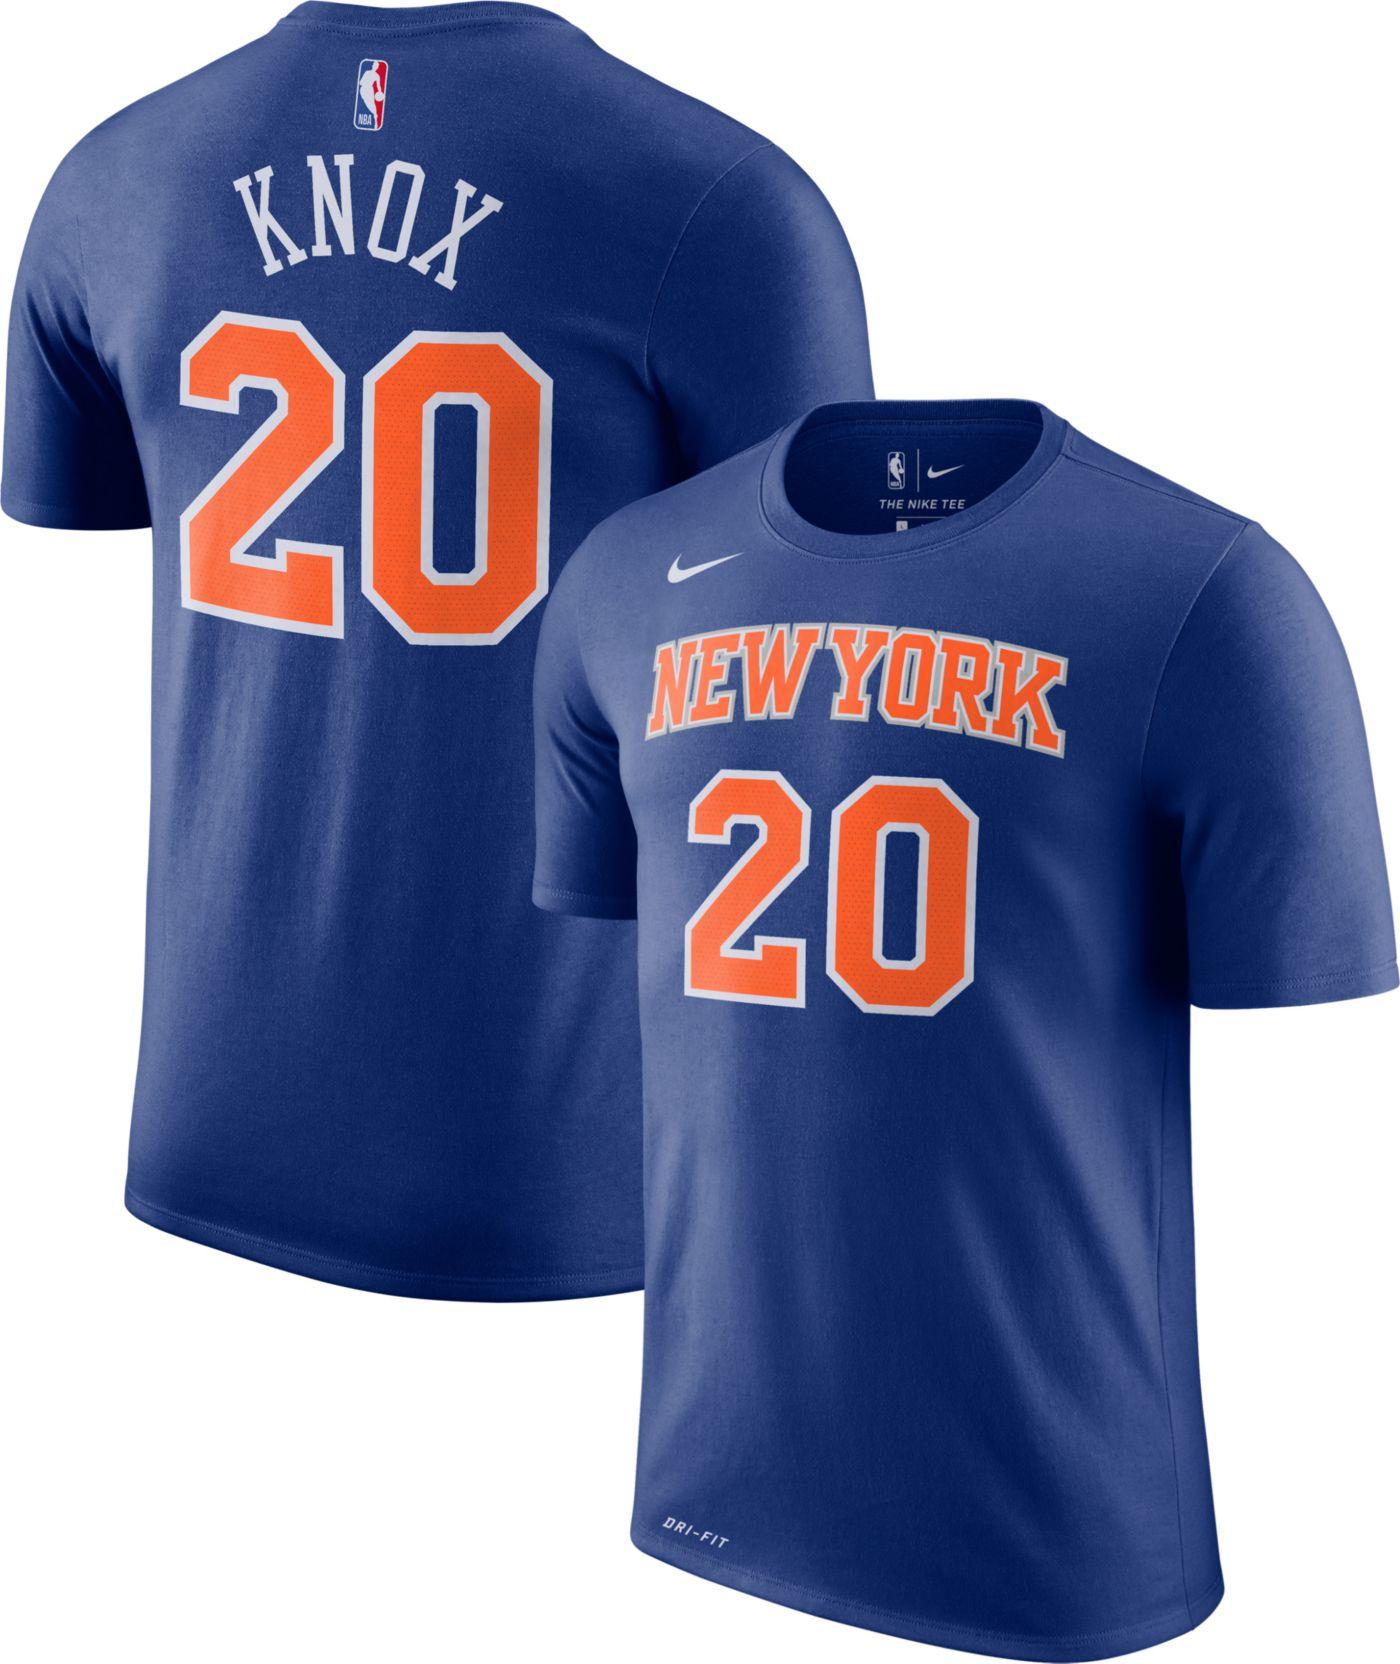 Nike Men's New York Knicks Kevin Knox #20 Dri-FIT Blue T-Shirt